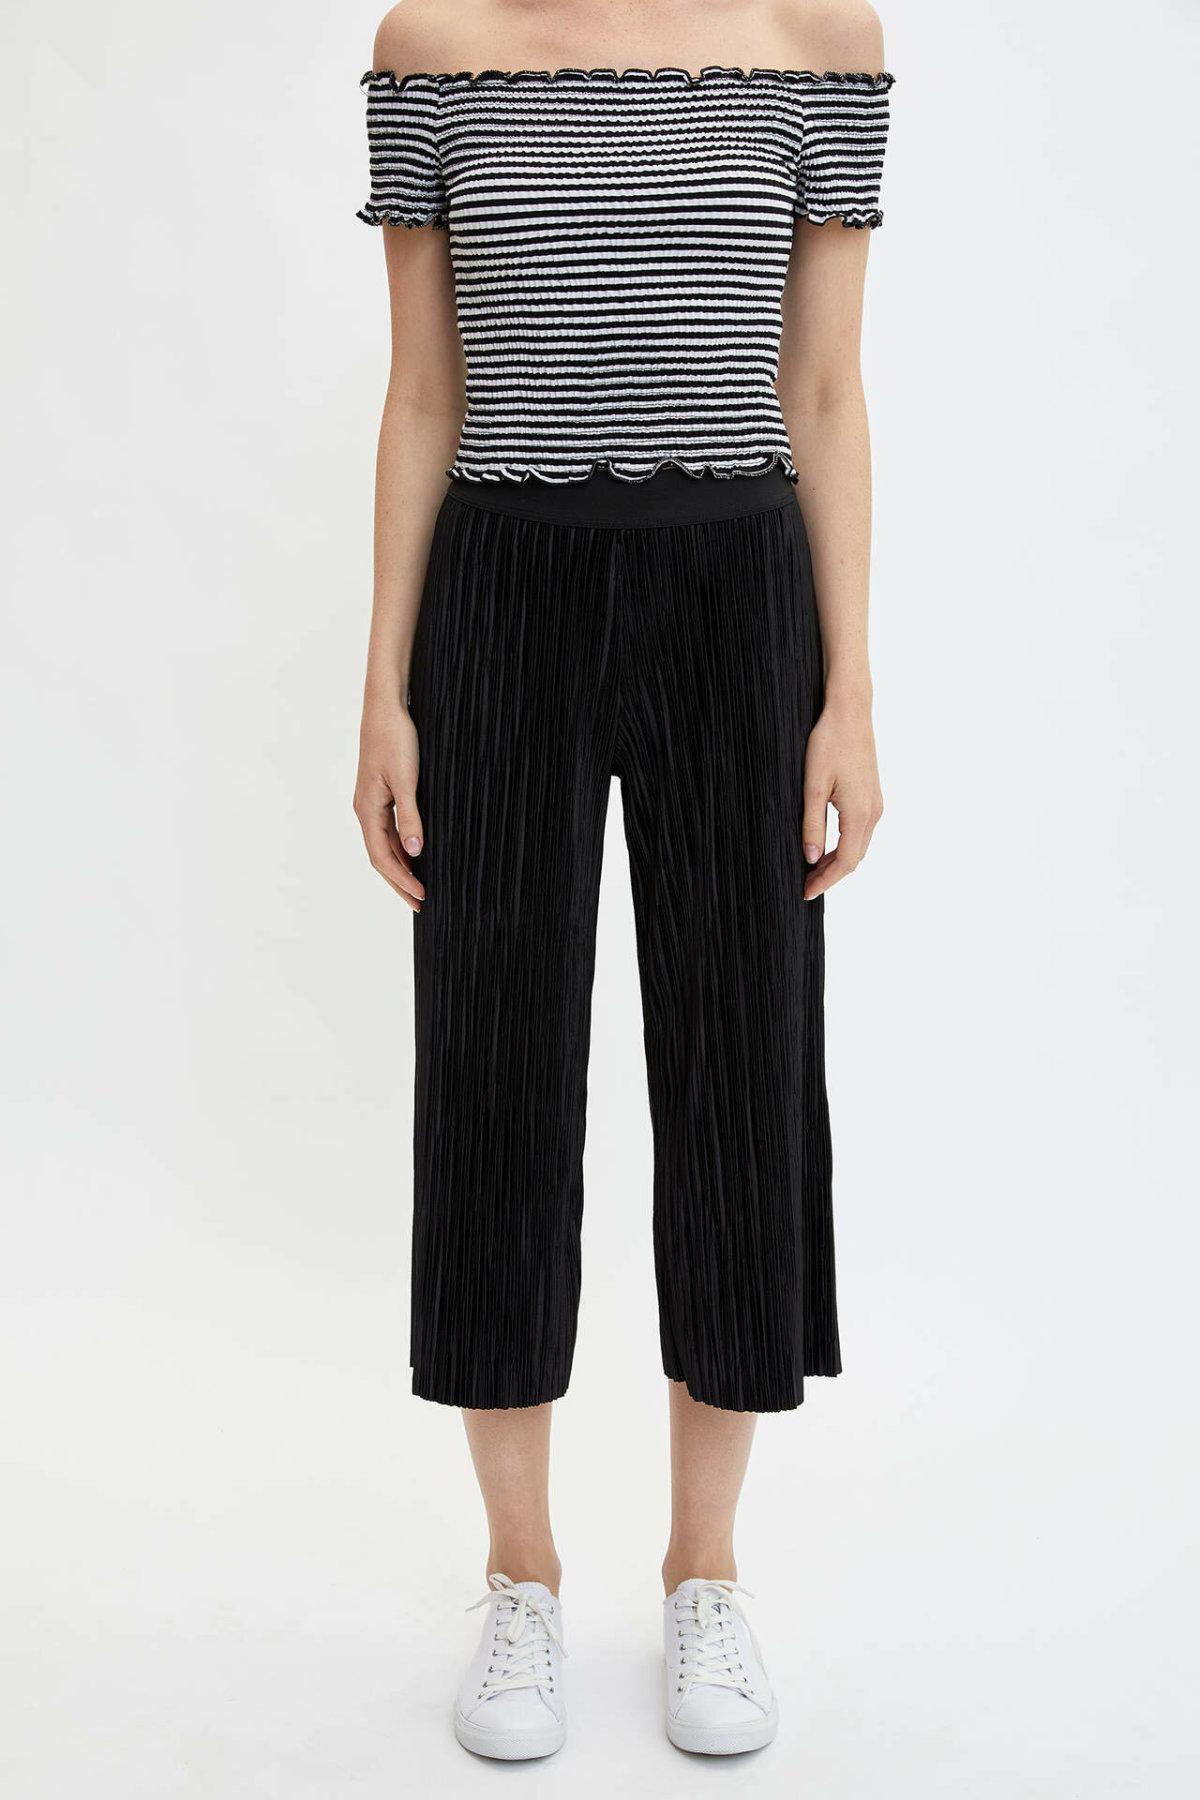 DeFacto Woman Summer Wide-leg Pants Women Stylish Pleated Ninth Pants Female Elastic Black Bottoms Trousers-K8555AZ19SM